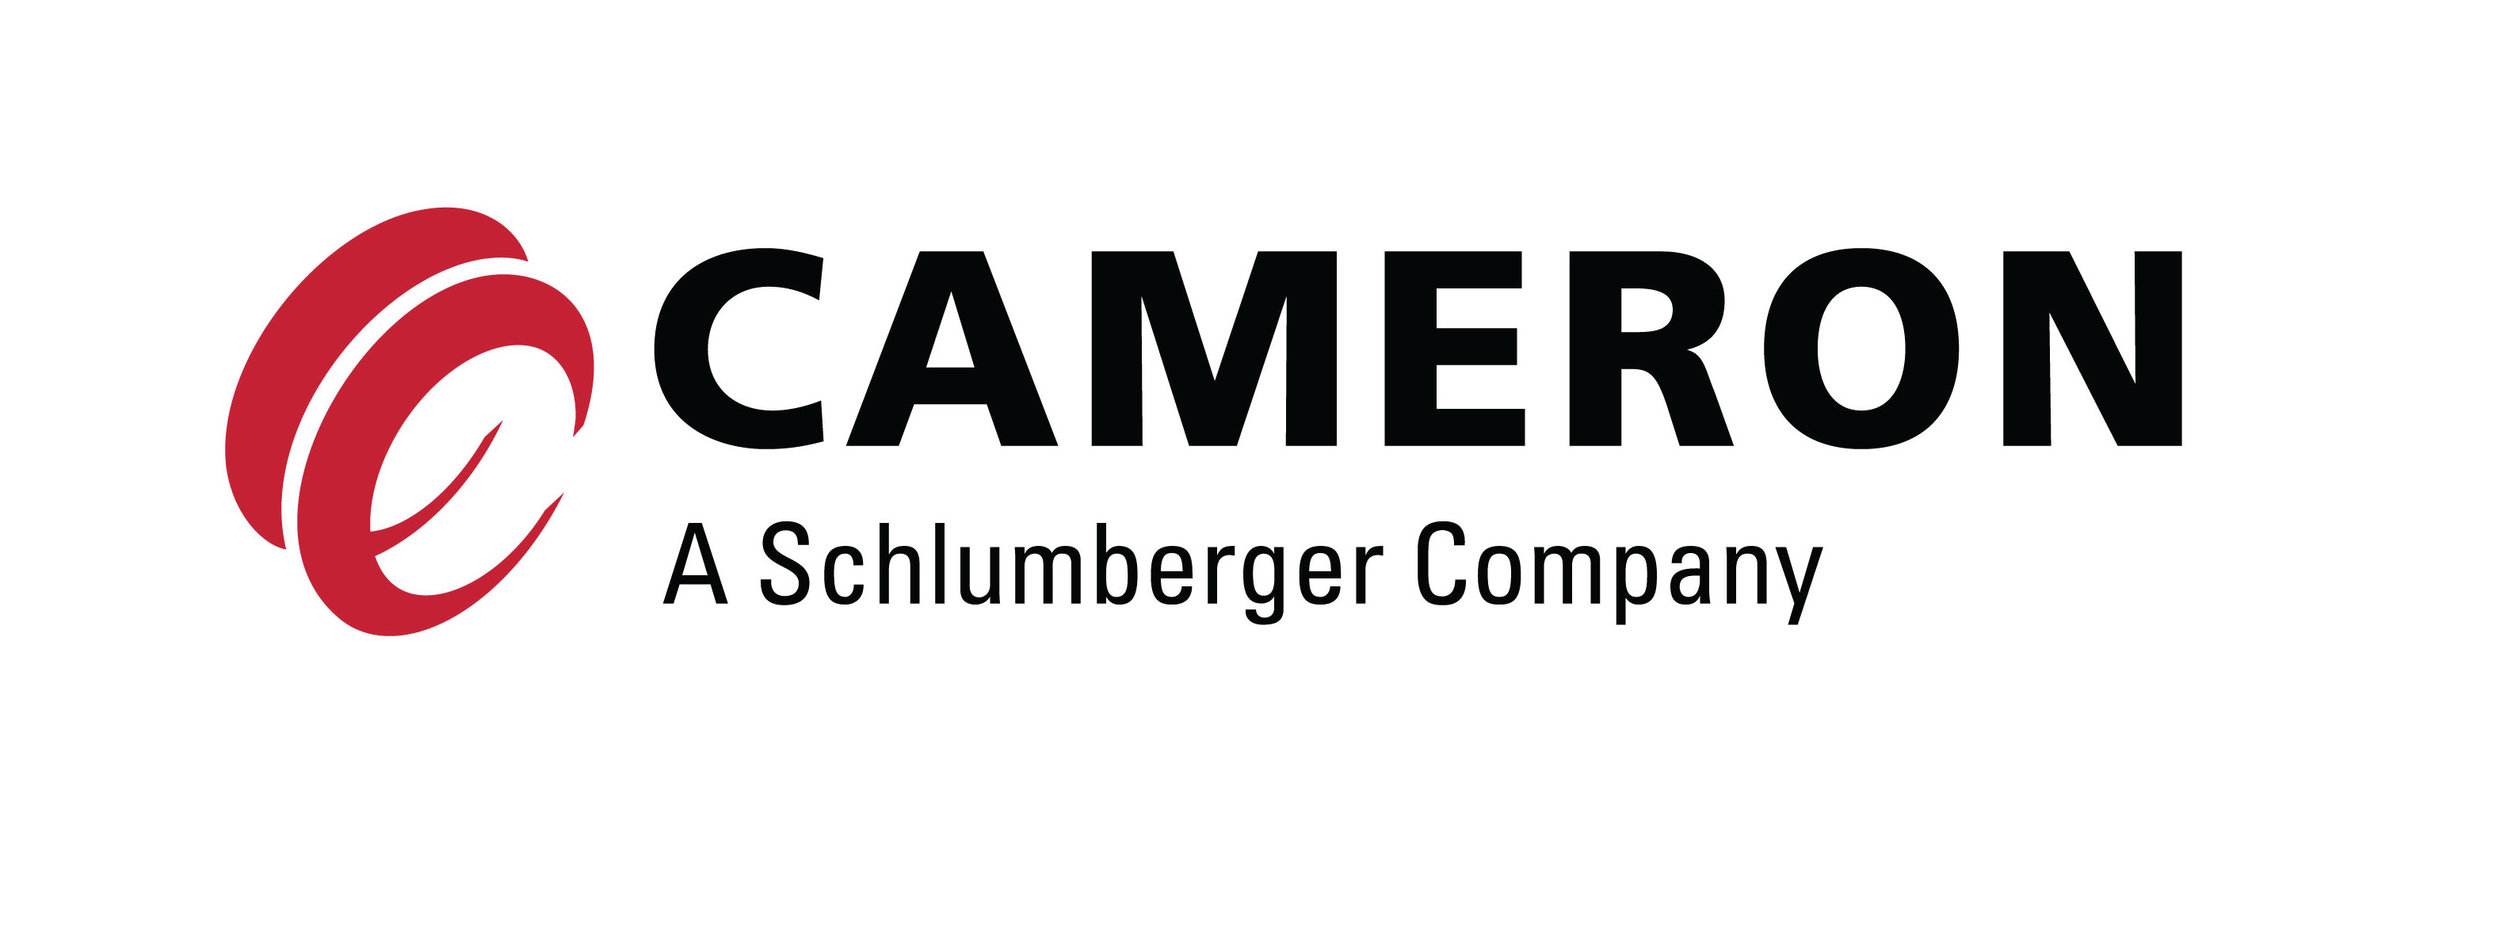 Cameron_website logo-01.jpg